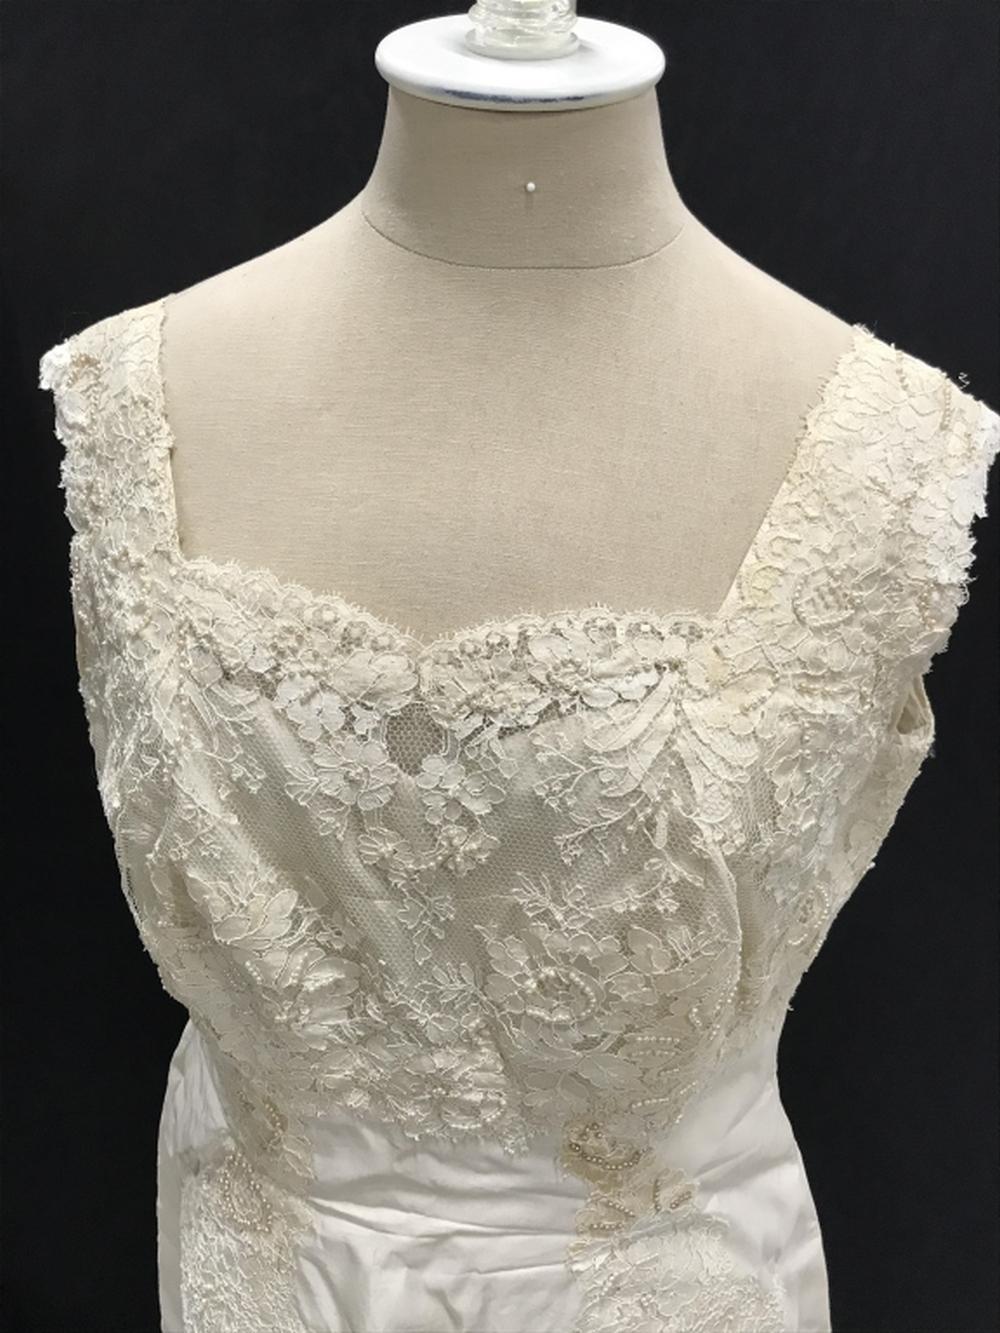 VINTAGE BERGDORF GOODMAN WEDDING DRESS &TRAIN